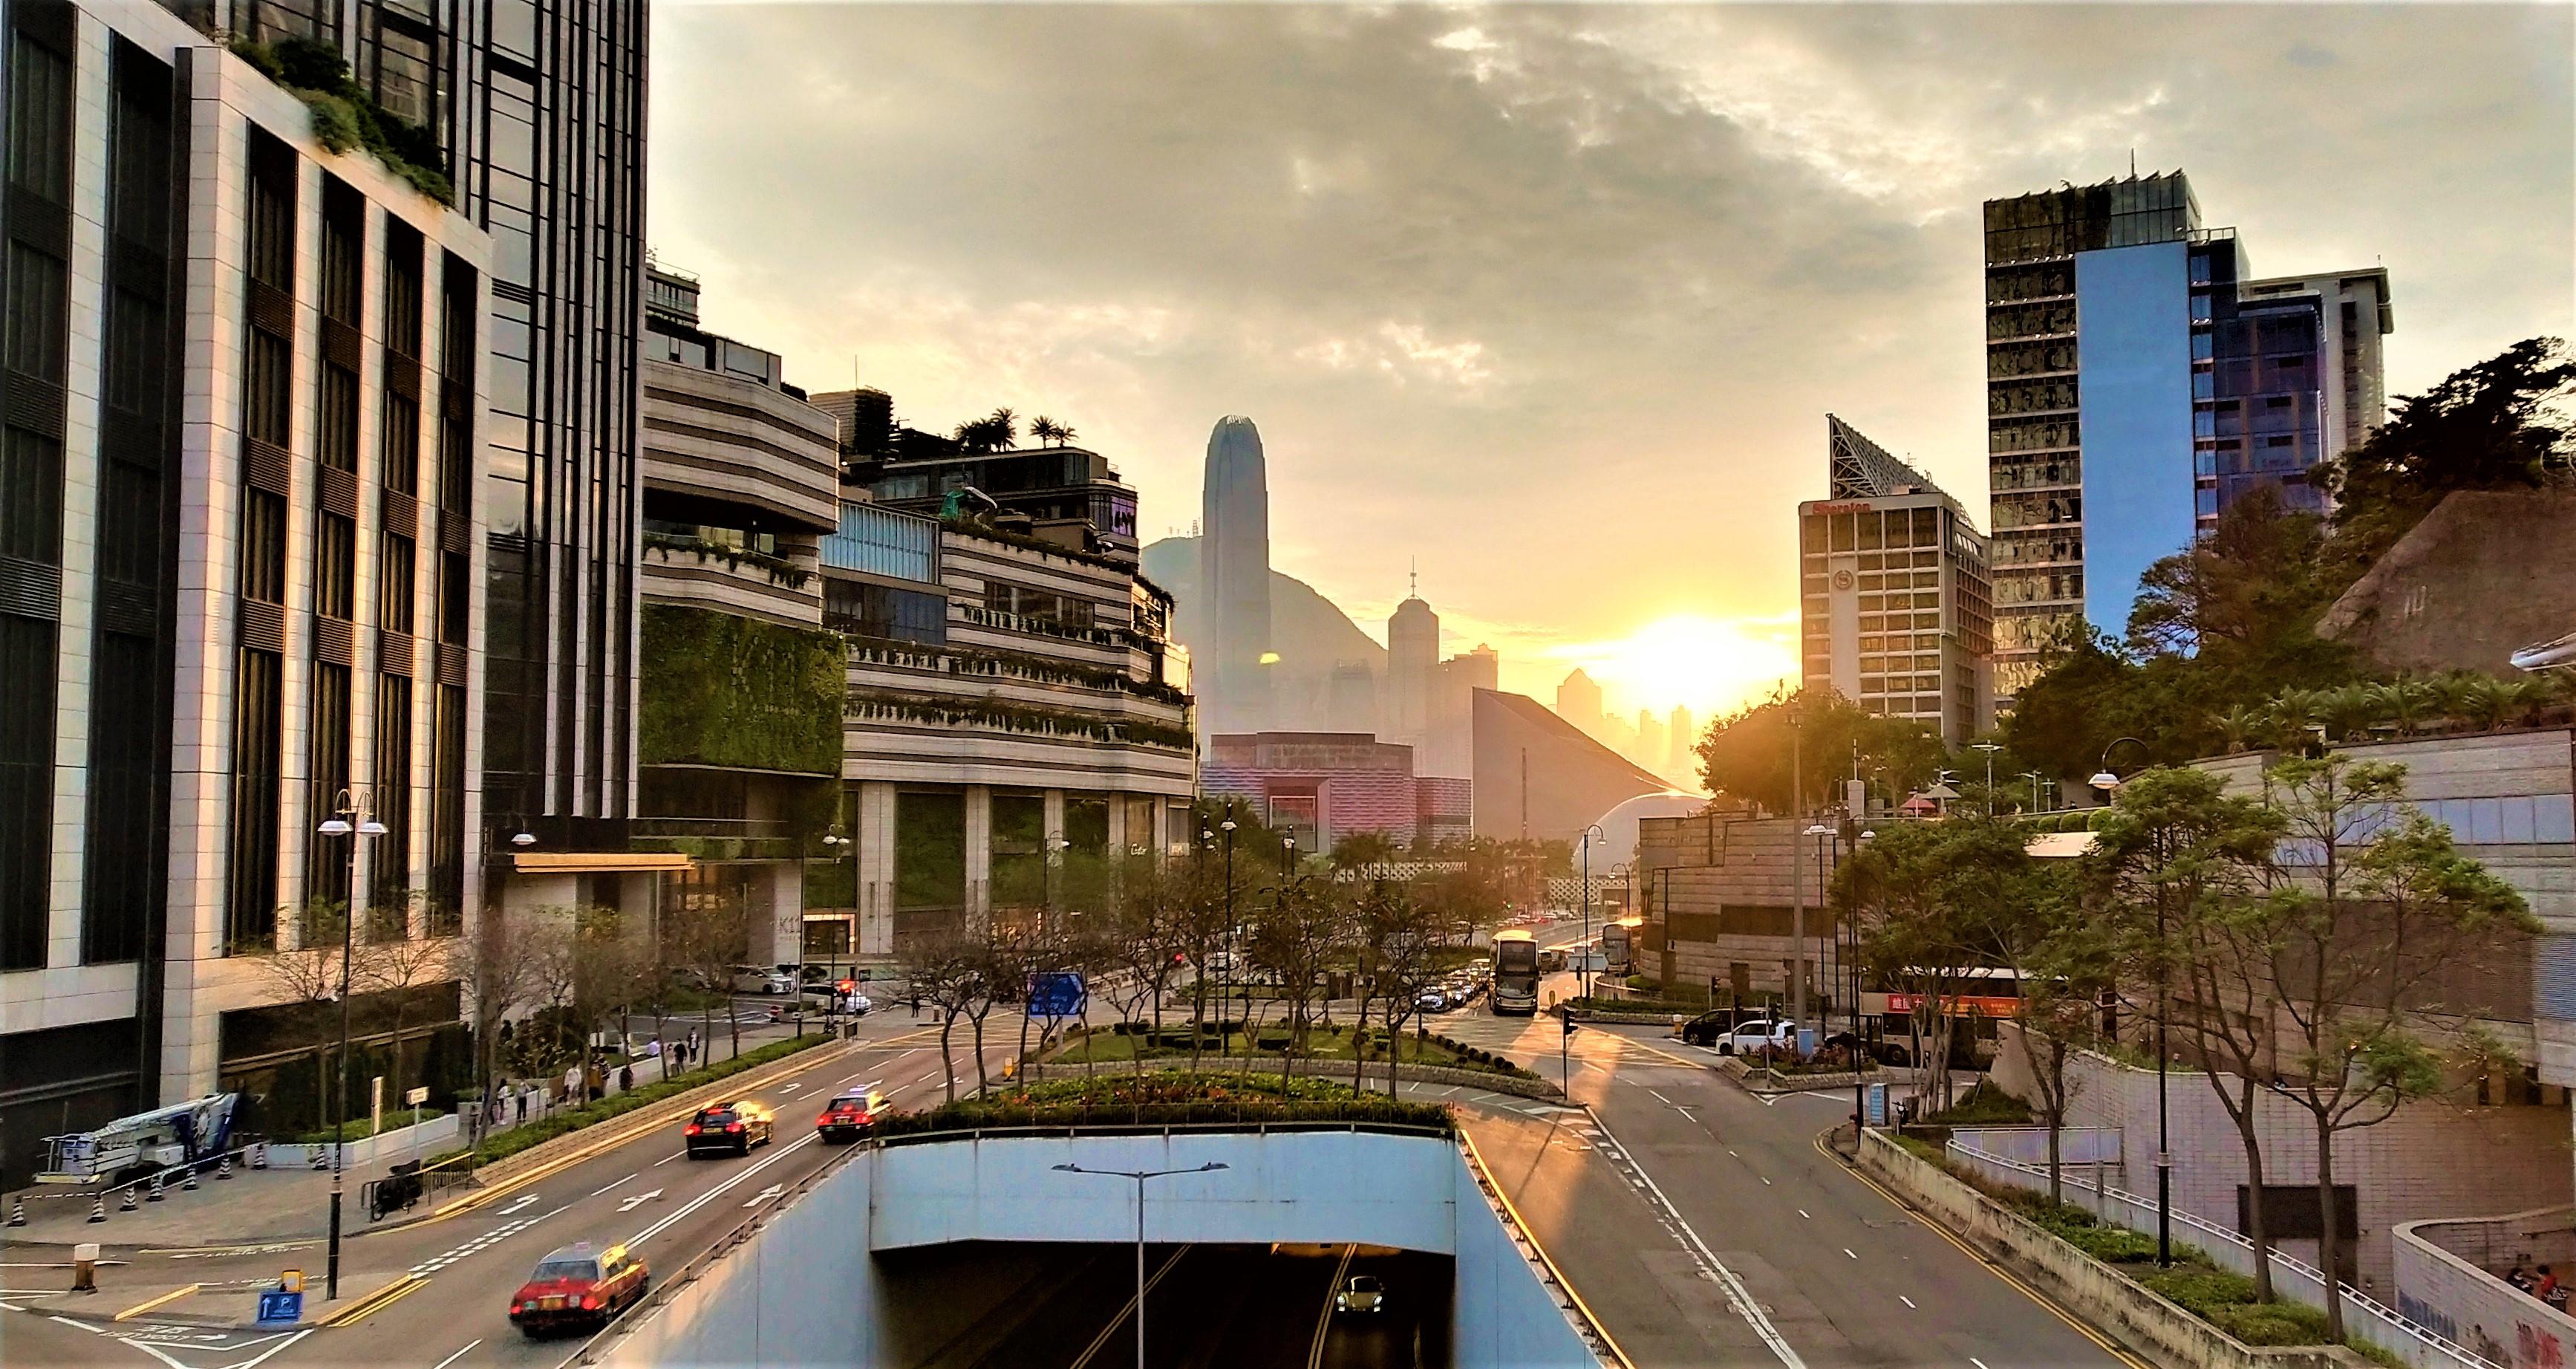 Tsim Sha Tsui, tunnel, roads, carsbuildings, sunset